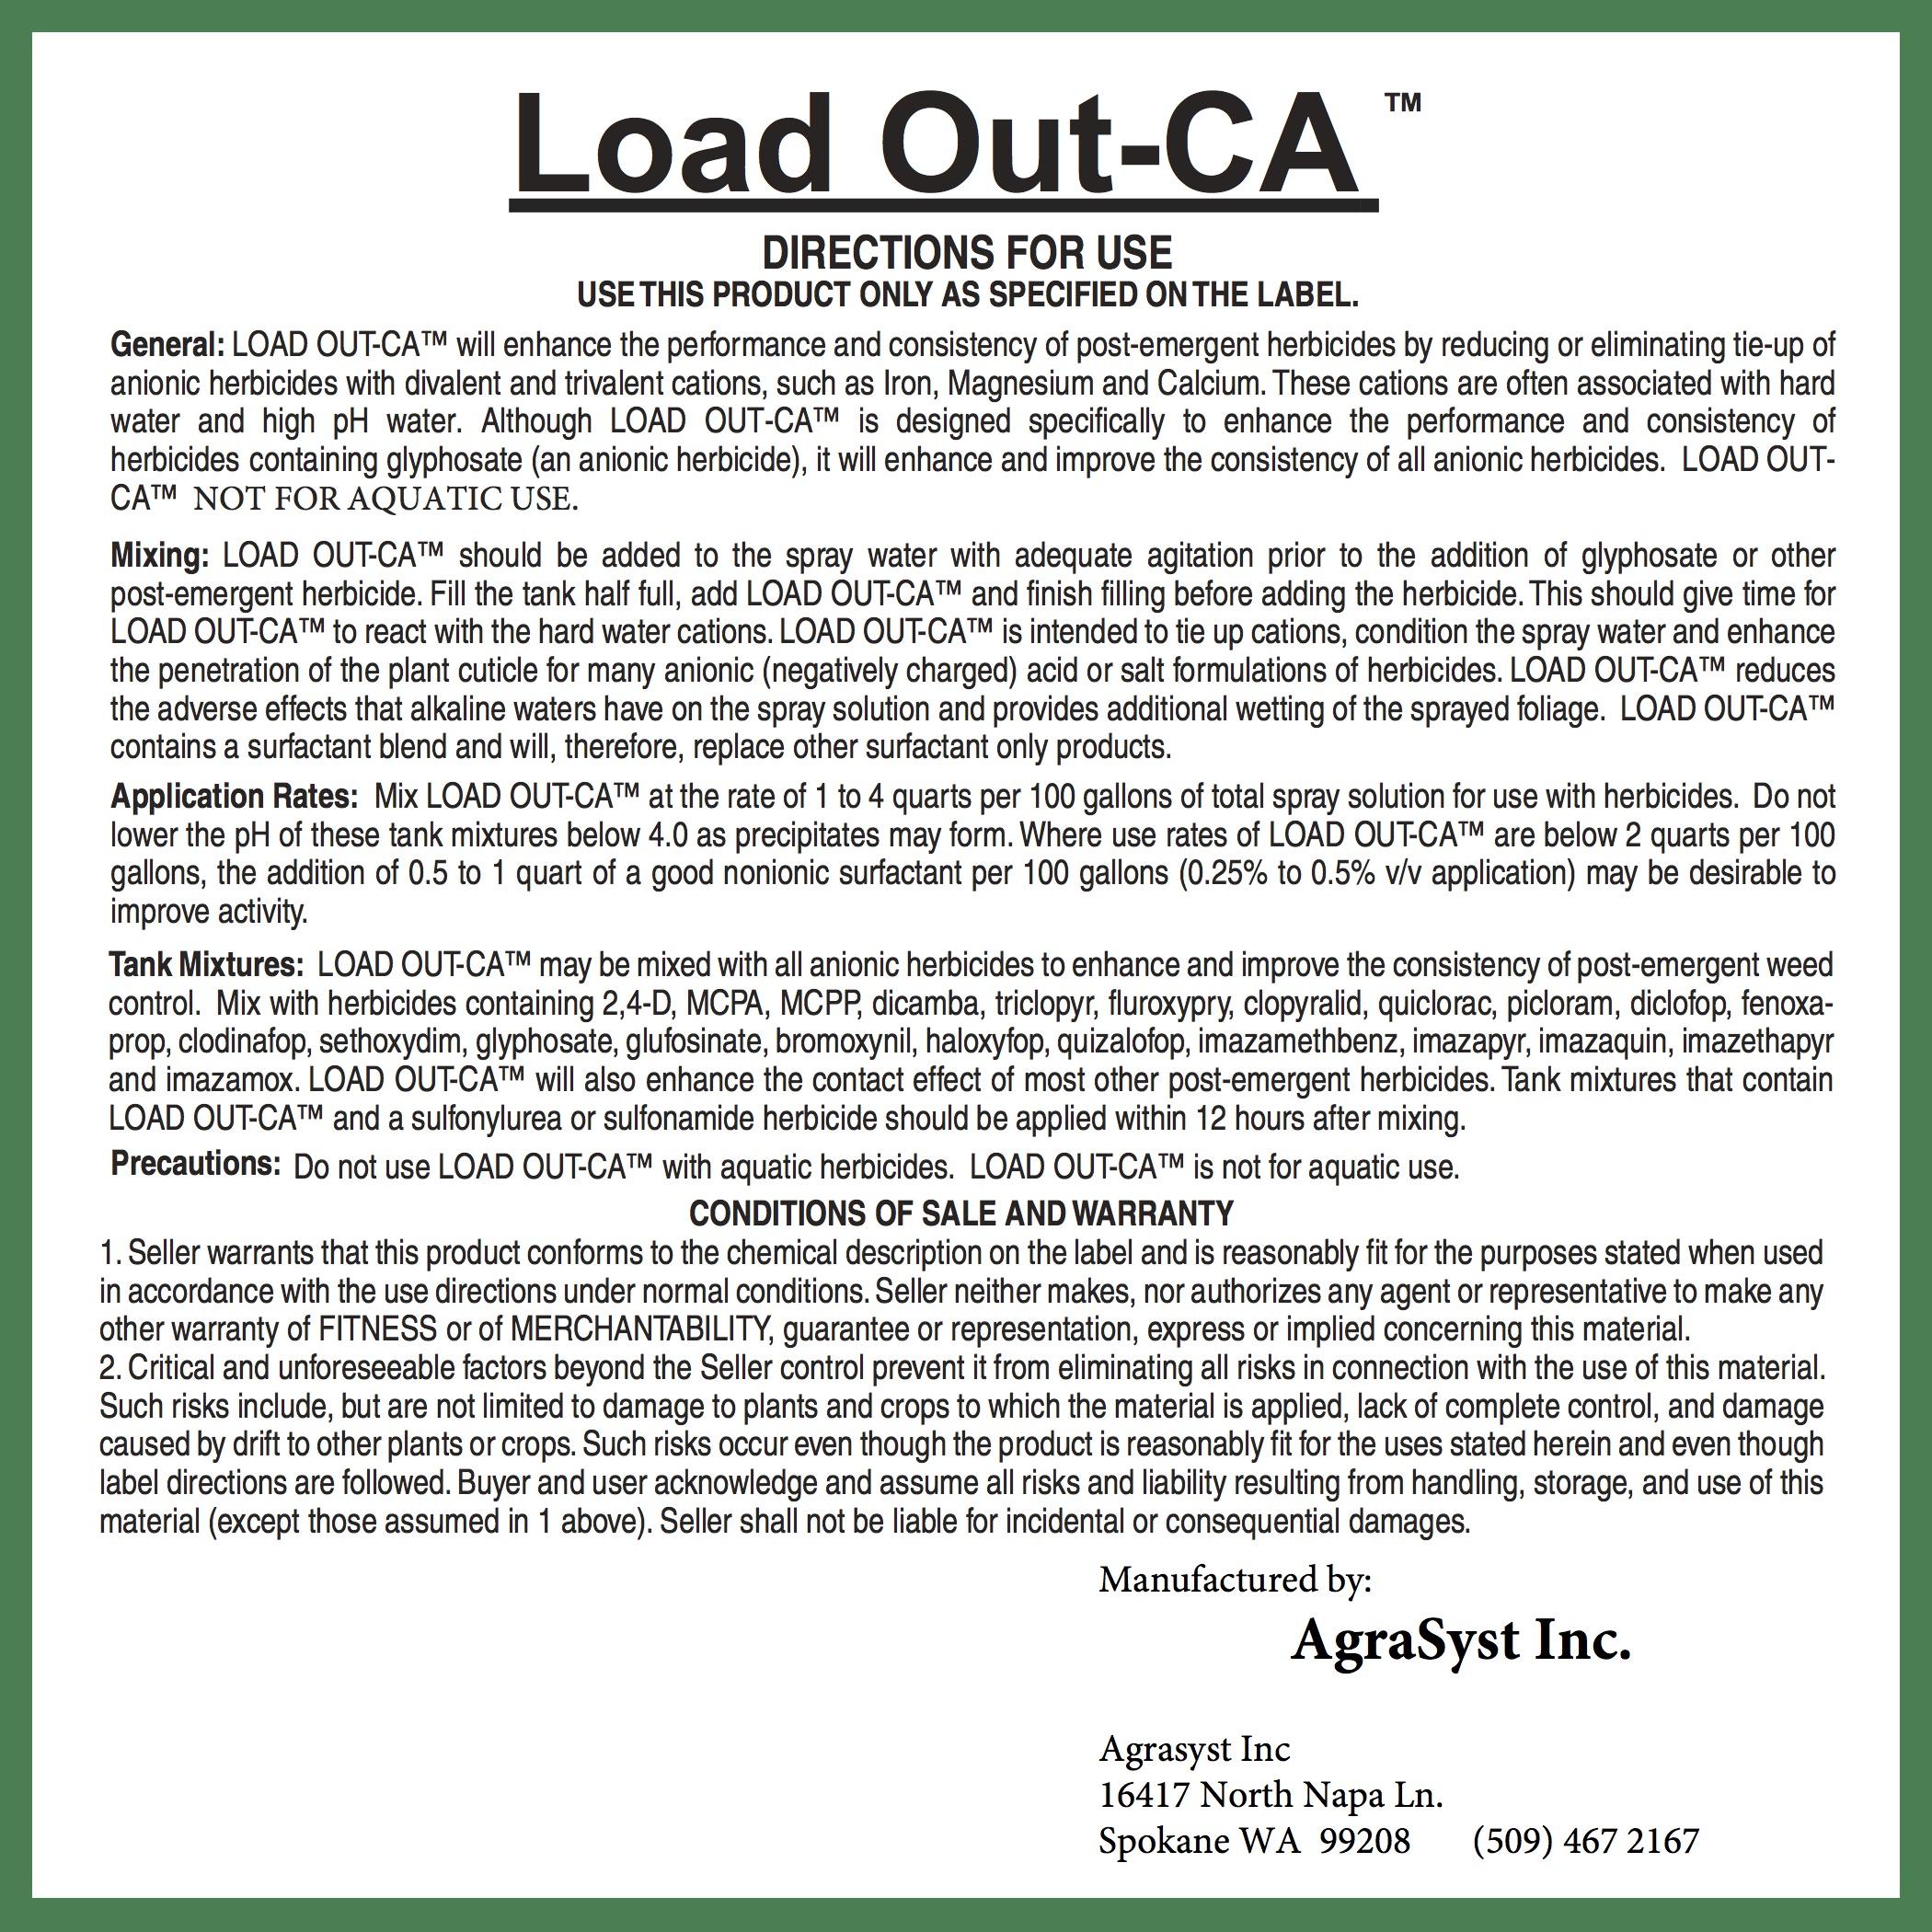 Load Out CA back label.jpg